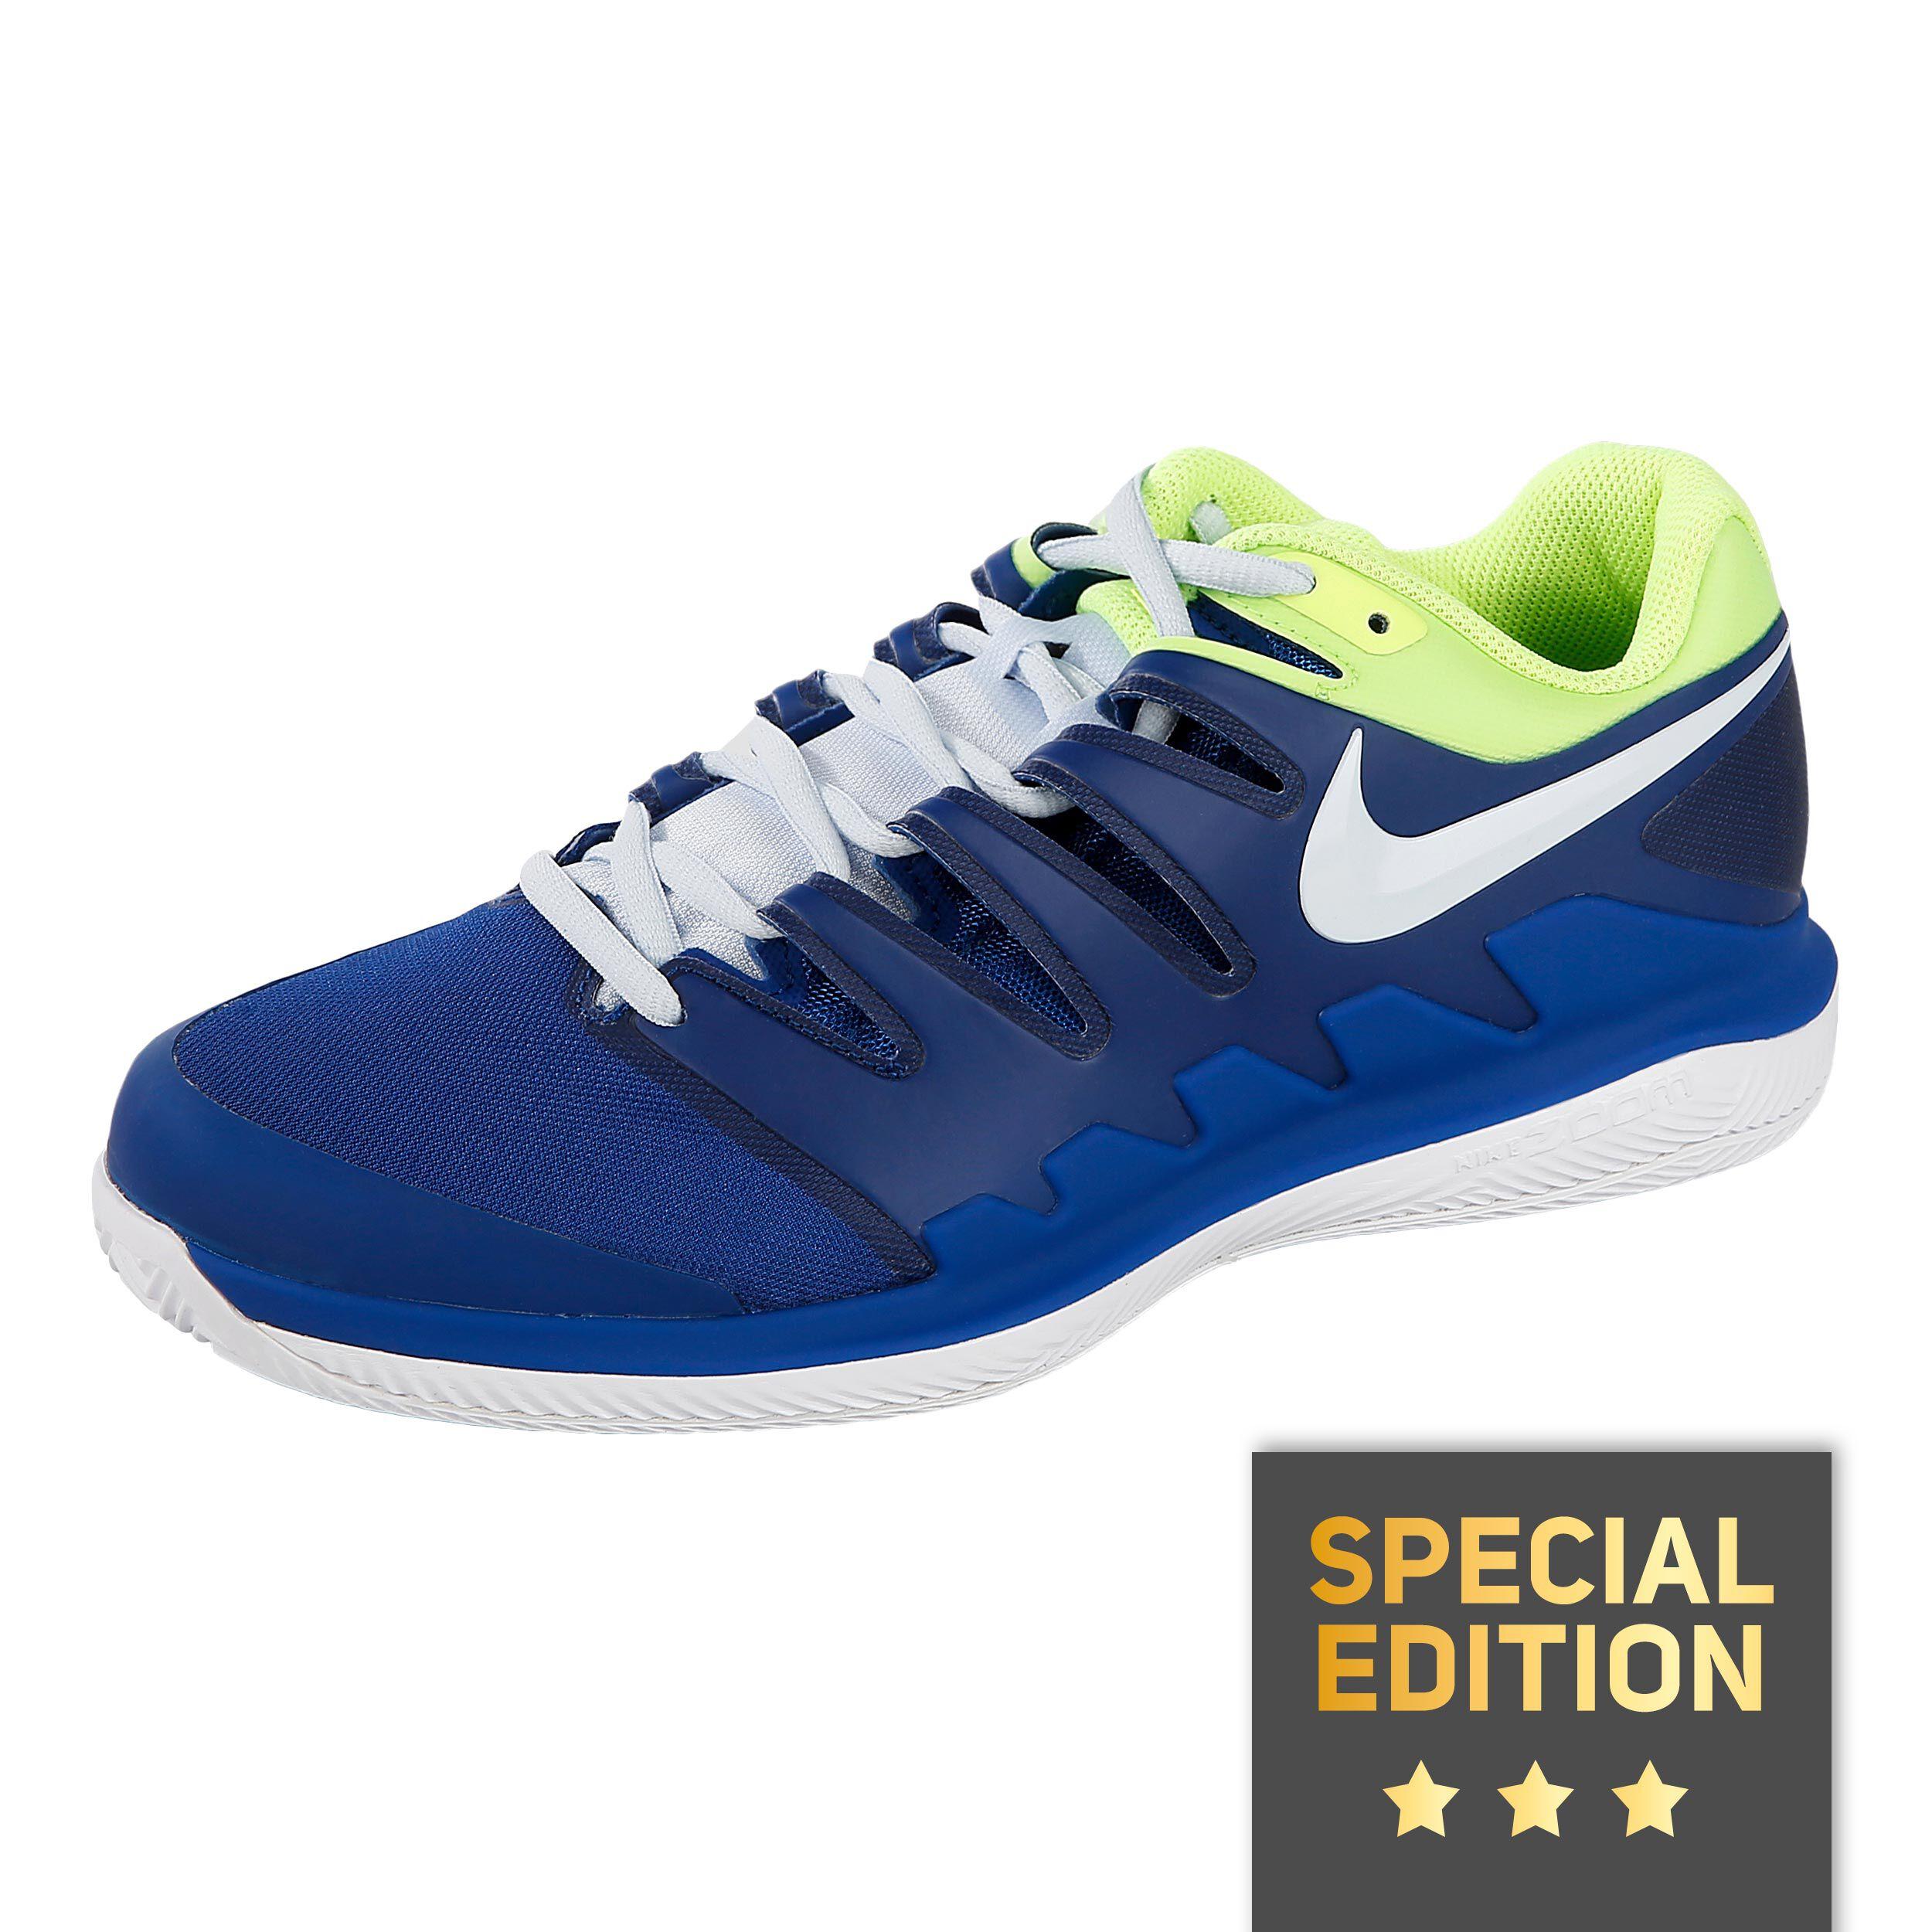 Herren Tennis Schuhe. Nike CH